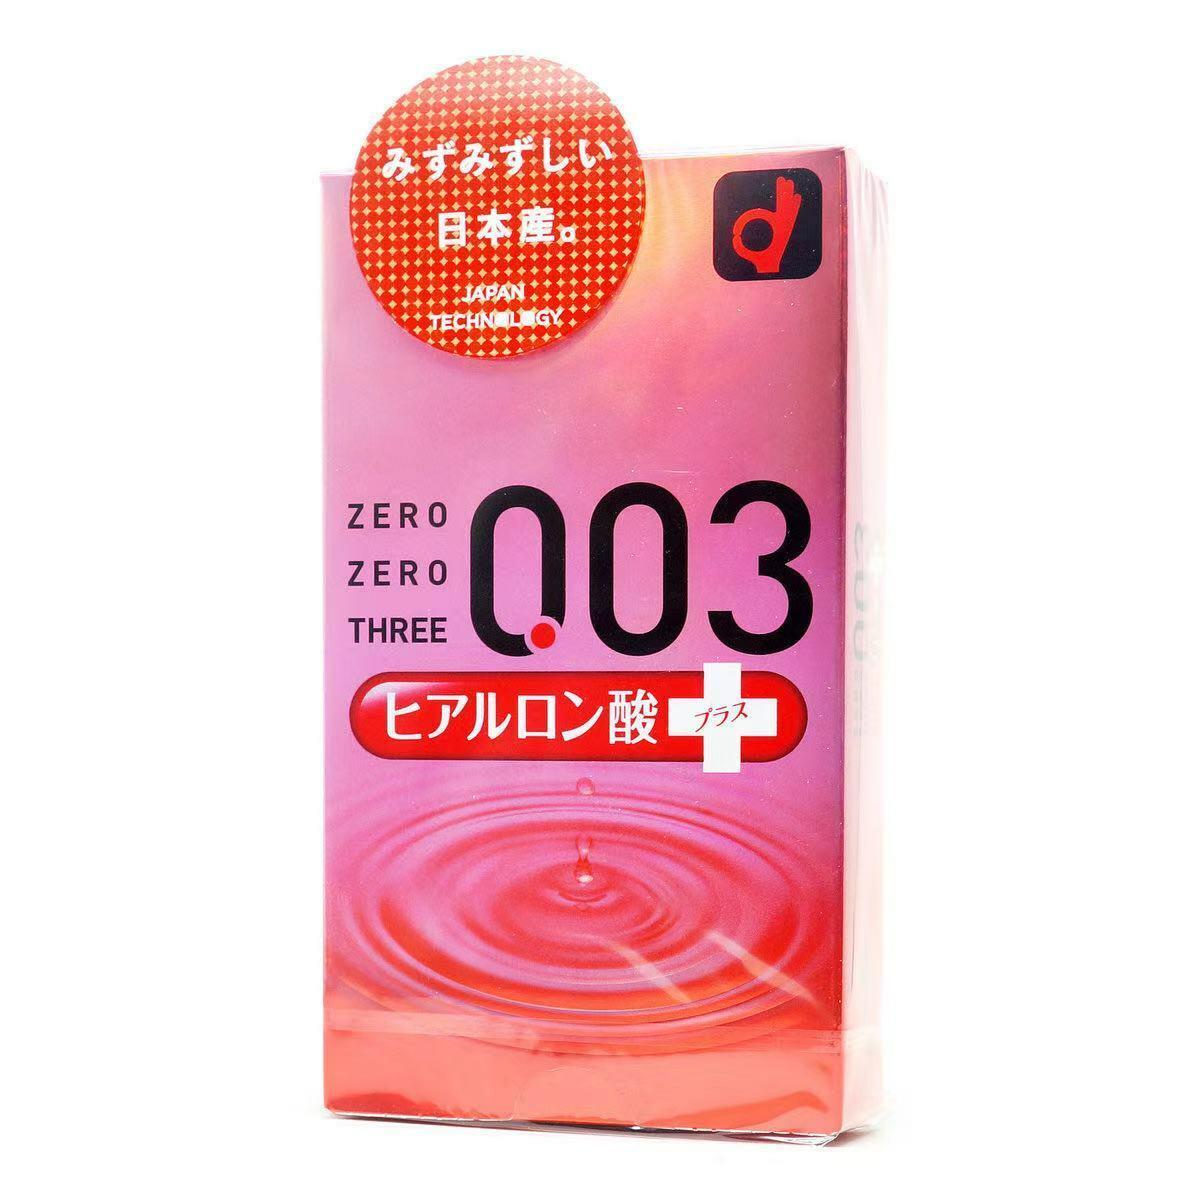 Okamoto 003 Hyaluronic Acid condoms Moisture lubricant 10PCS Condoms & Contraceptives